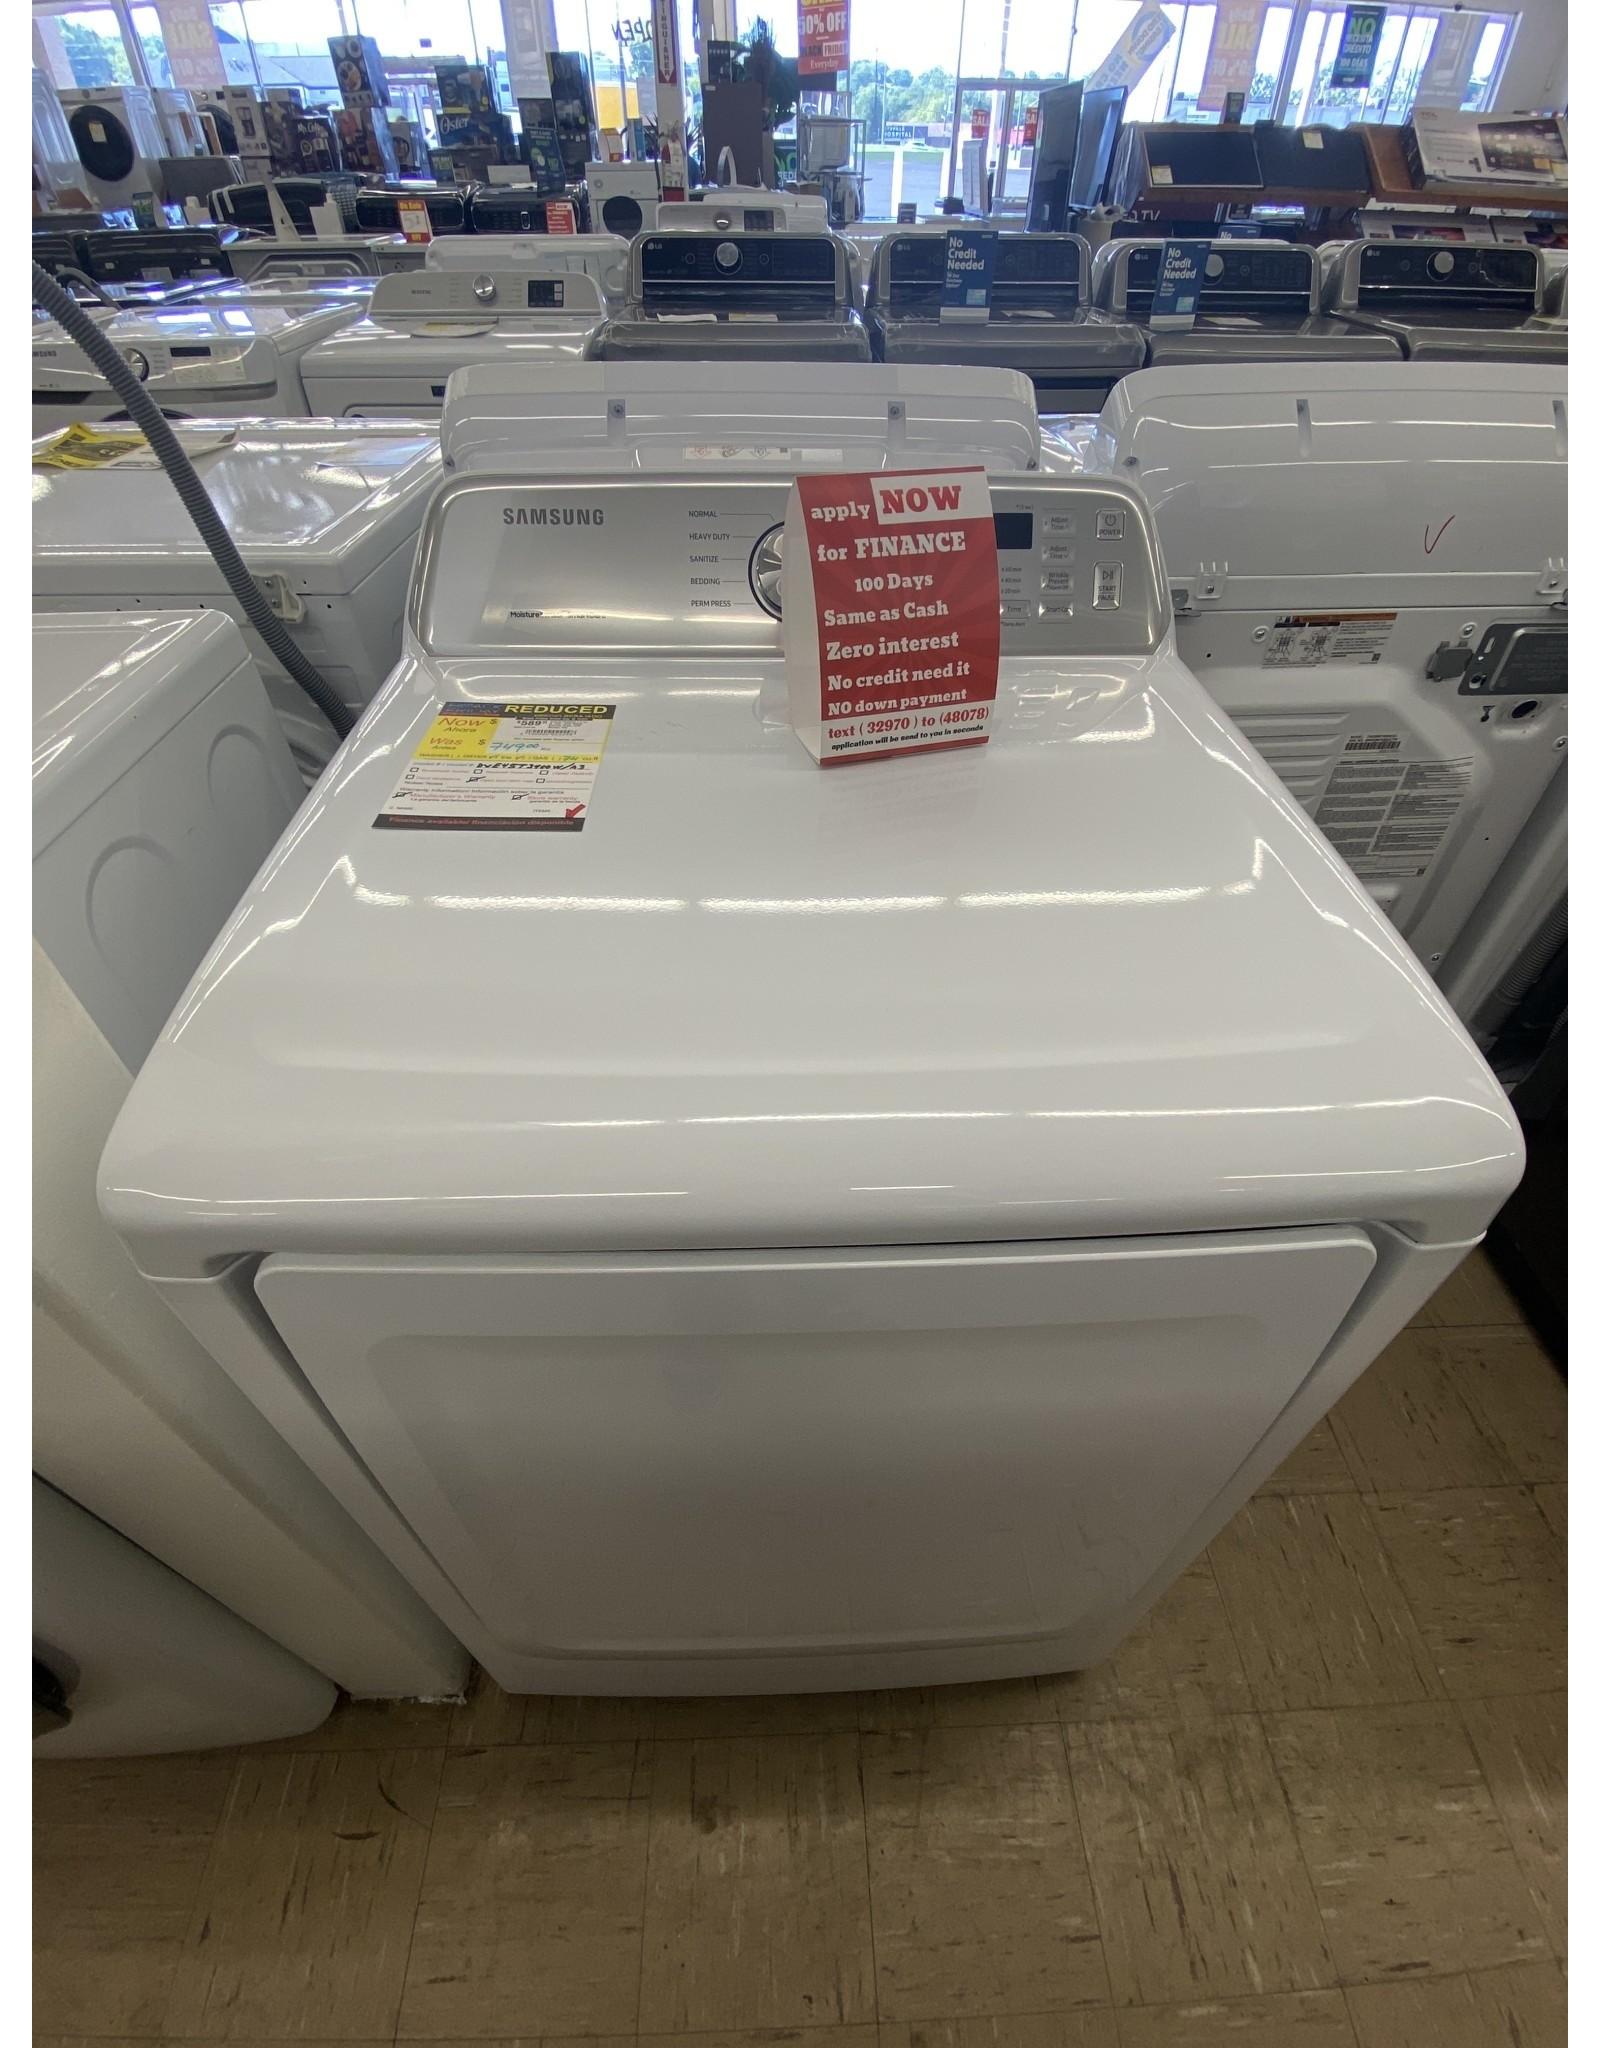 SAMSUNG DVE45T3400W  7.4 cu. ft. 240-Volt White Electric Dryer with Sensor Dry